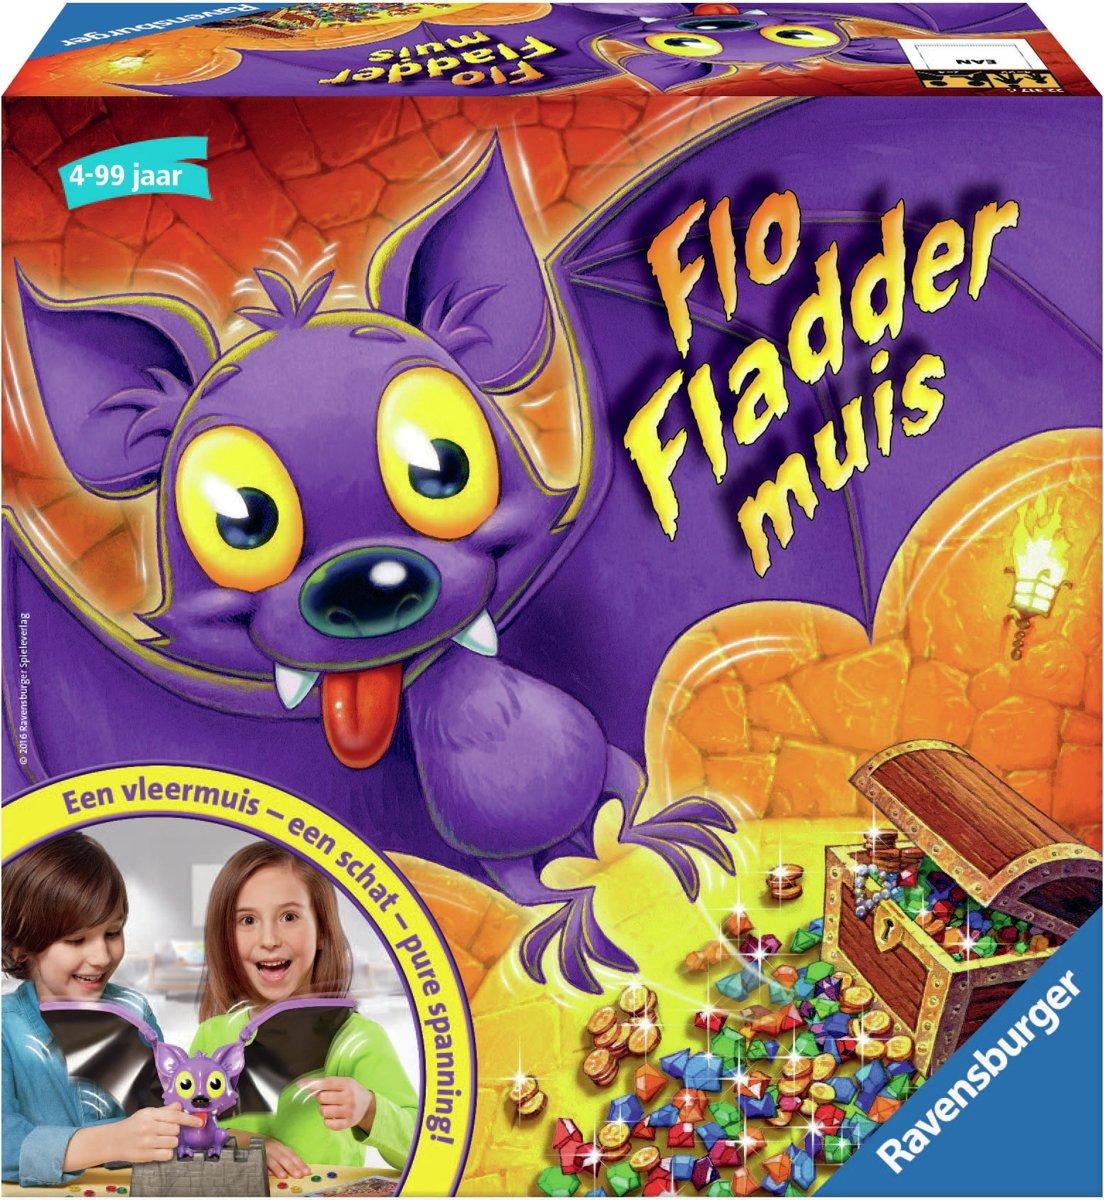 Ravensburger Flo Fladdermuis voor €9,99